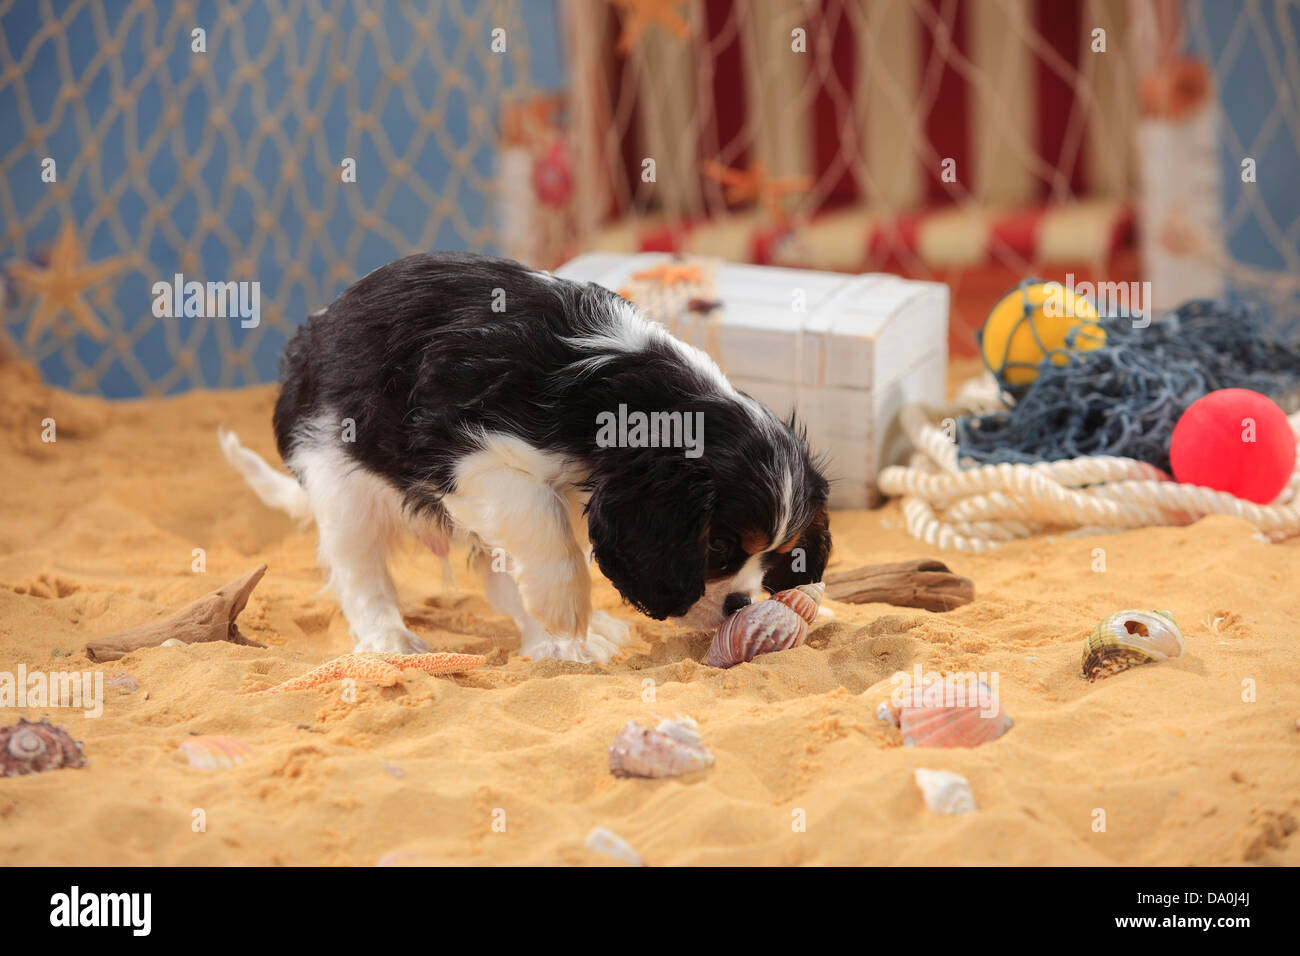 Cavalier King Charles Spaniel, puppy, tricolour, 9 weeks  Cavalier King Charles Spaniel, Welpe, tricolour, 9 Wochen - Stock Image